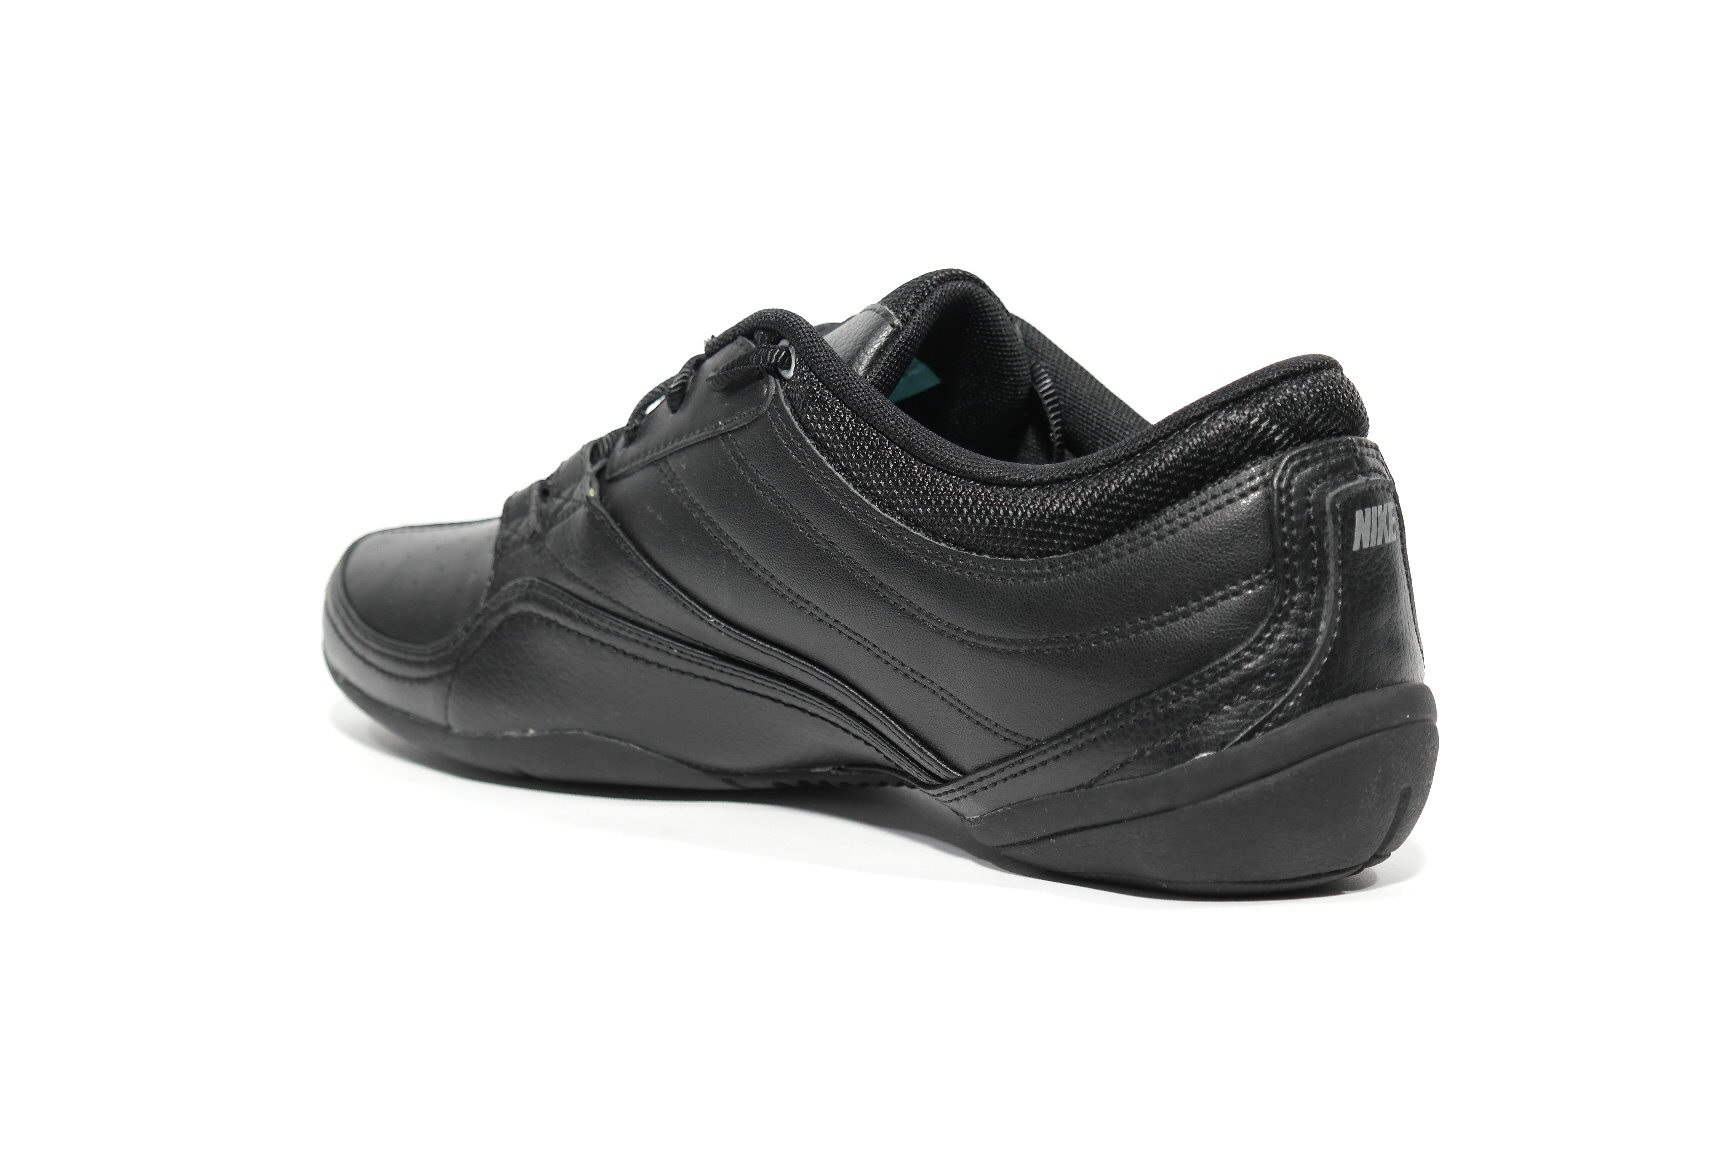 ... Nike Air Devine Dames fitness schoenen zwart ...